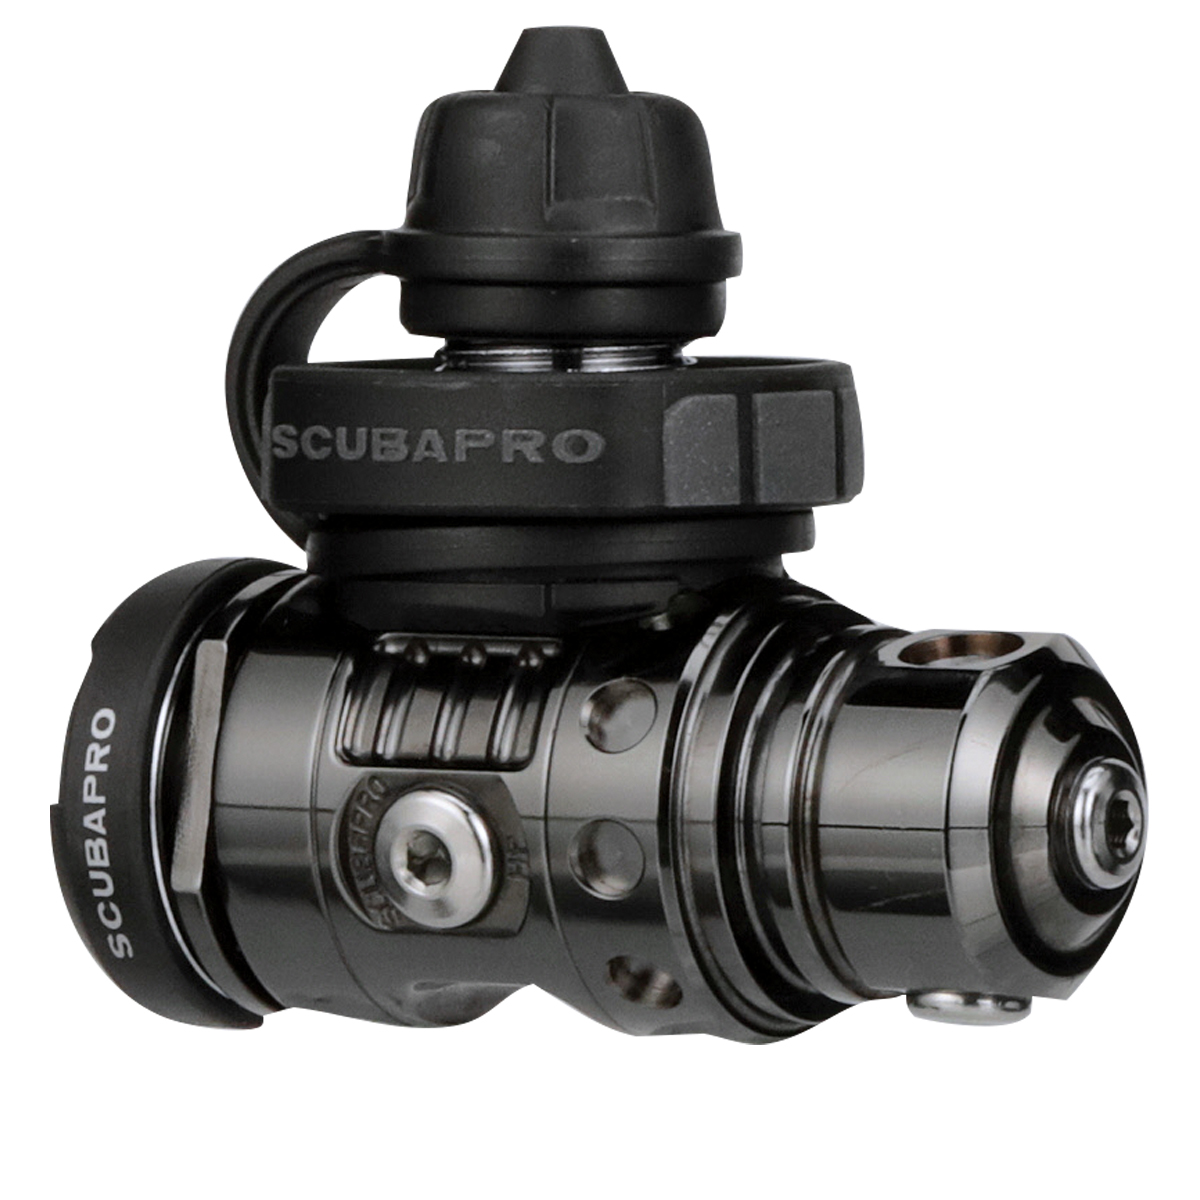 Scubapro MK19 DIN EVO BT / G260 Carbon BT